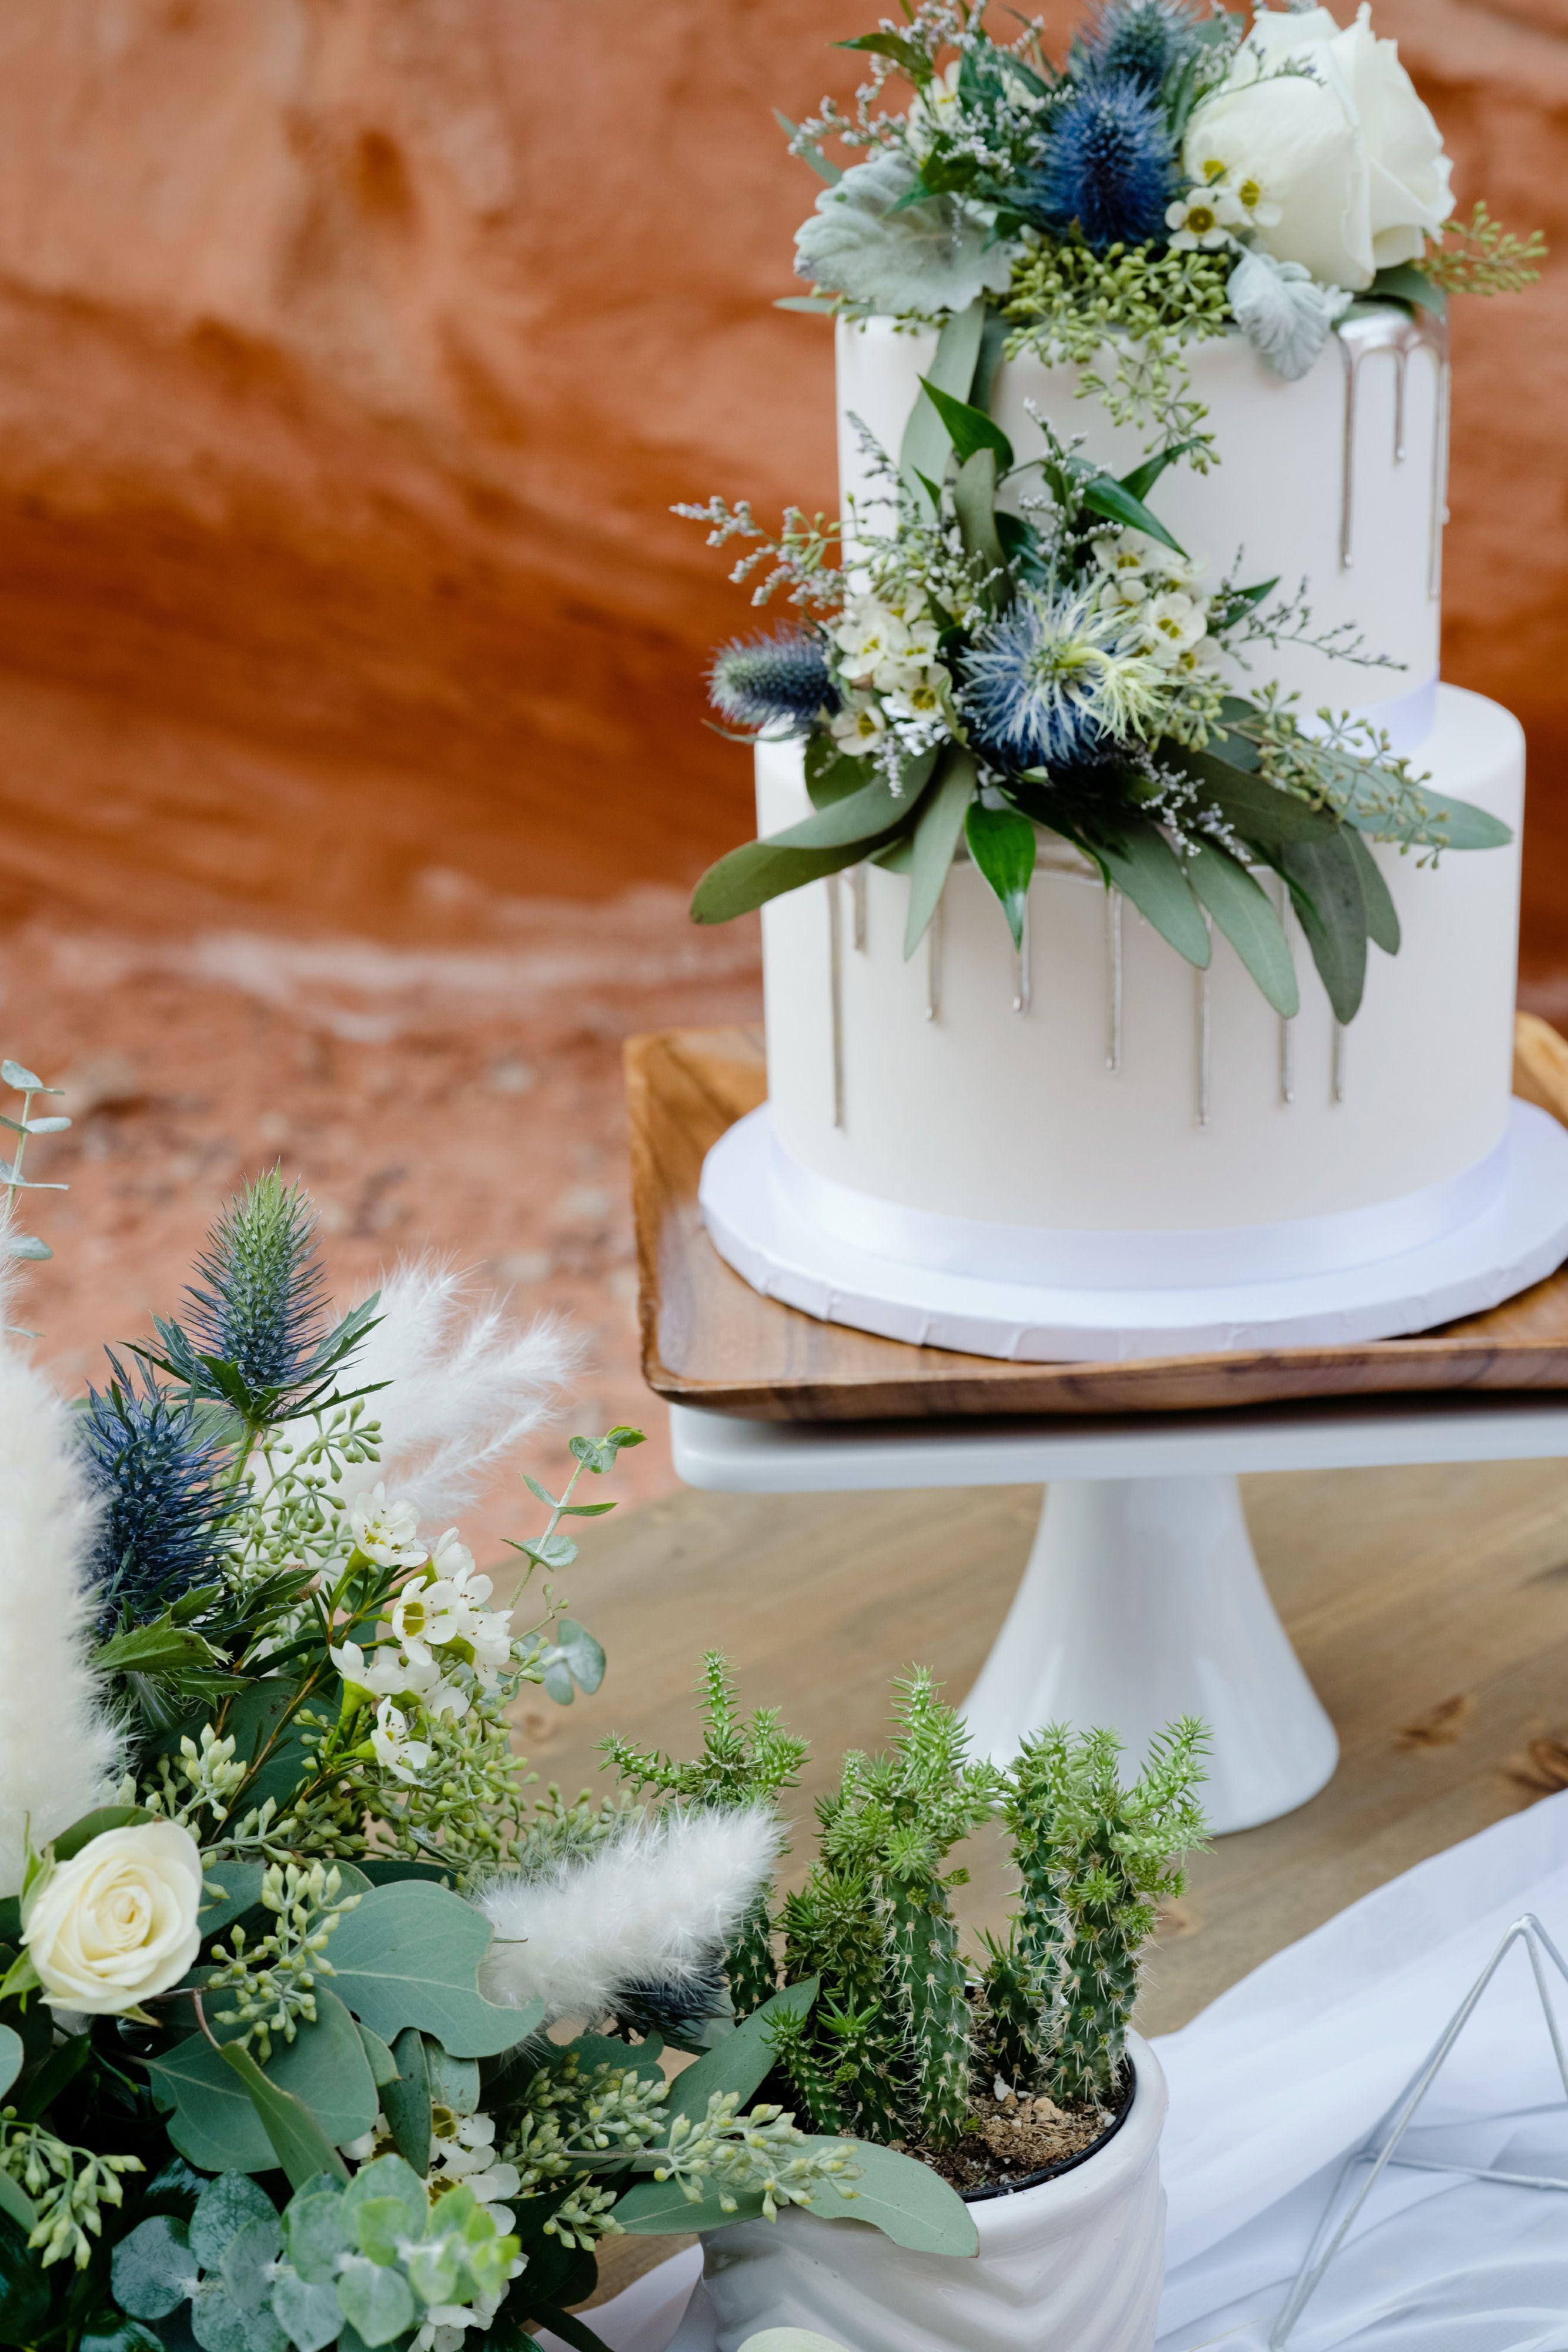 Simple Elegant Wedding Cake with Florals | Desert